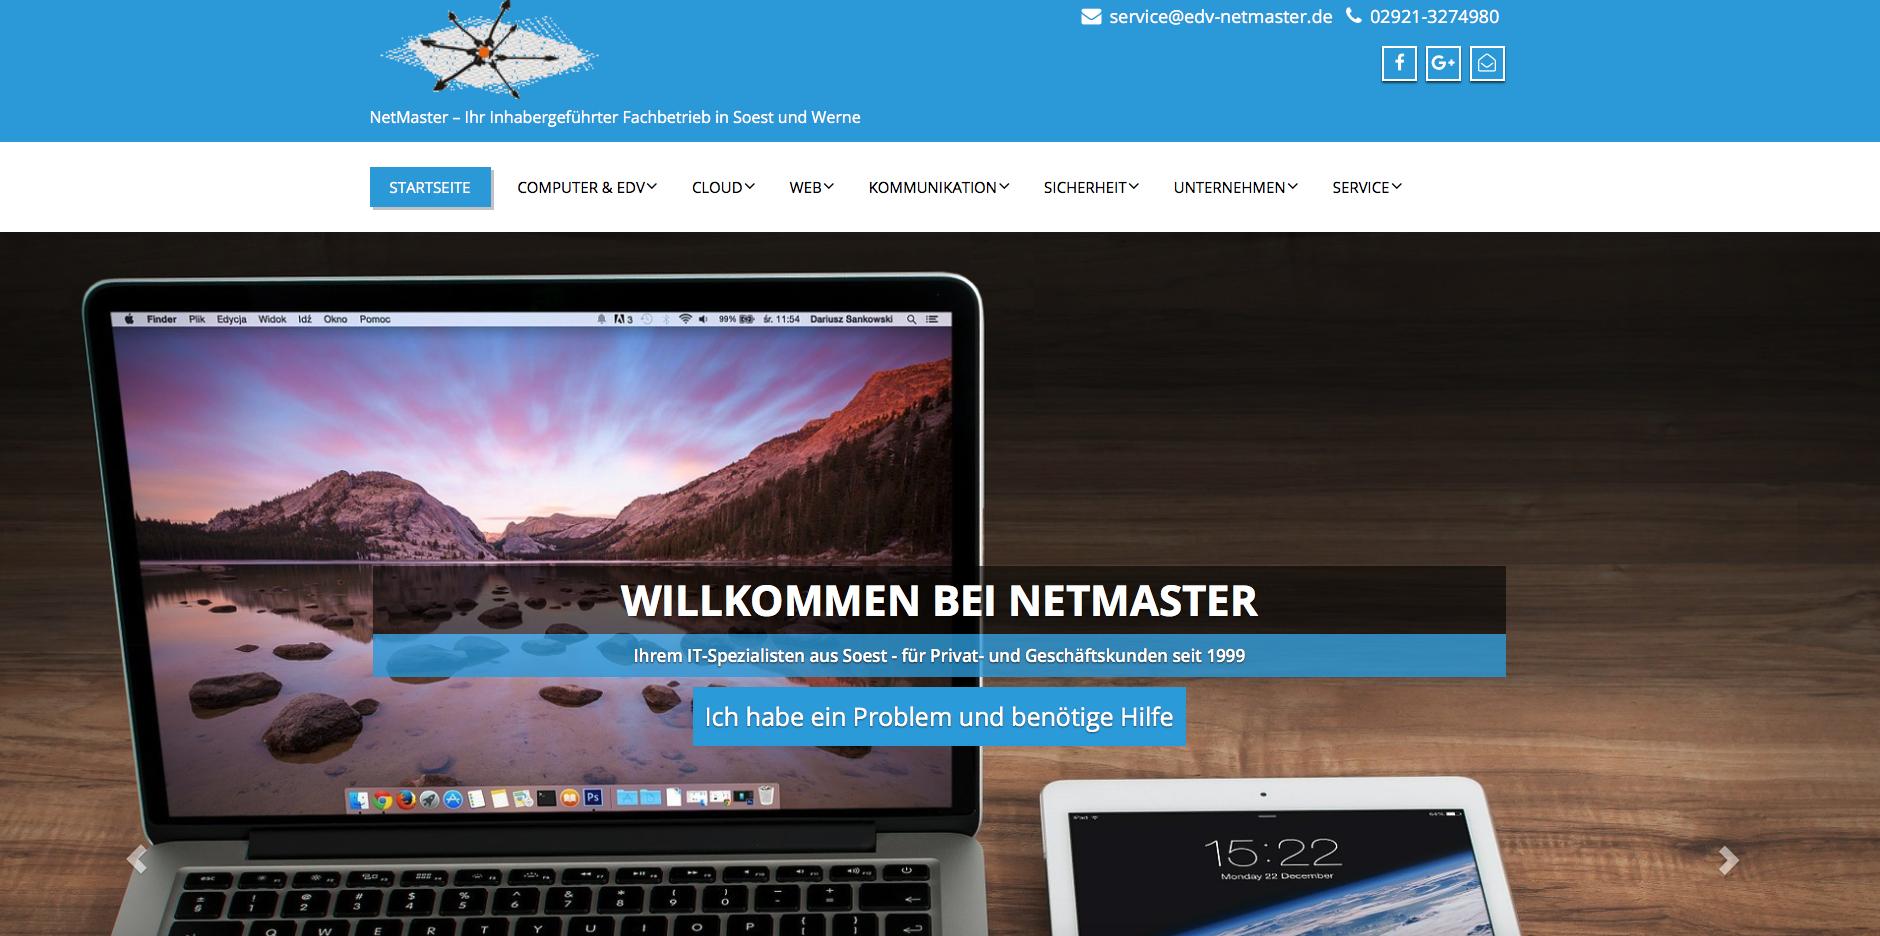 www.edv-netmaster.de